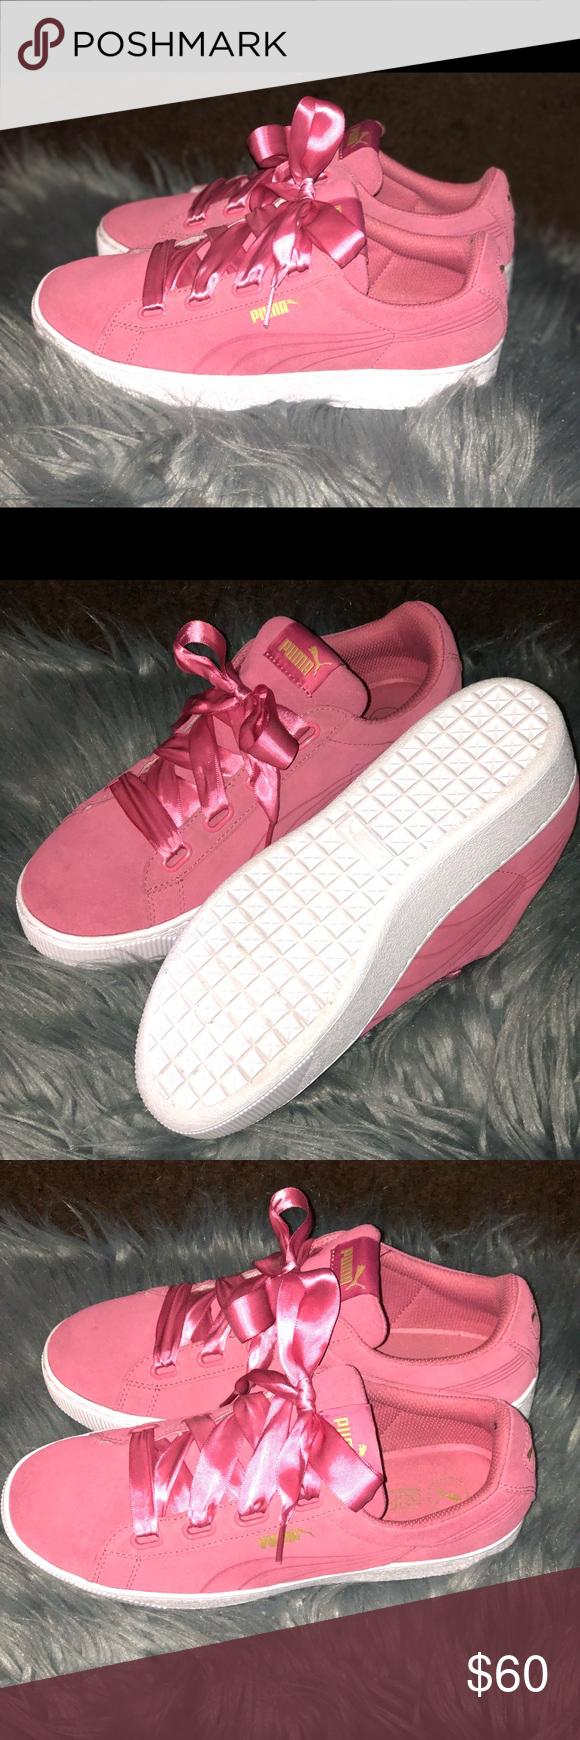 Pink Suede 💗 soft foam Pumas Size 9